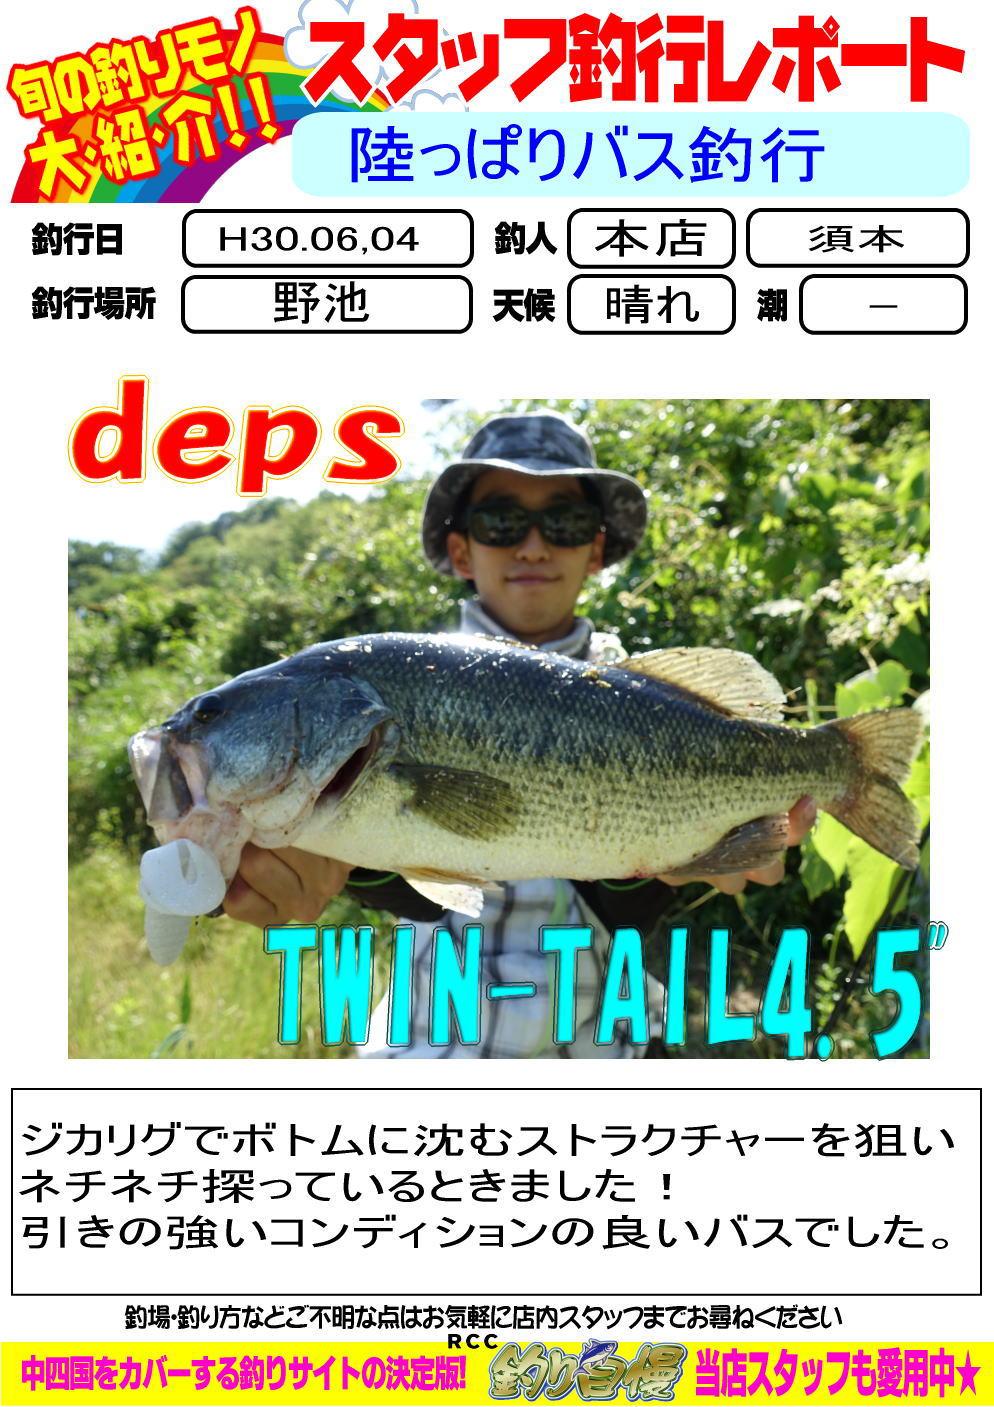 http://www.e-angle.co.jp/shop/blog/H30.06.05.jpg